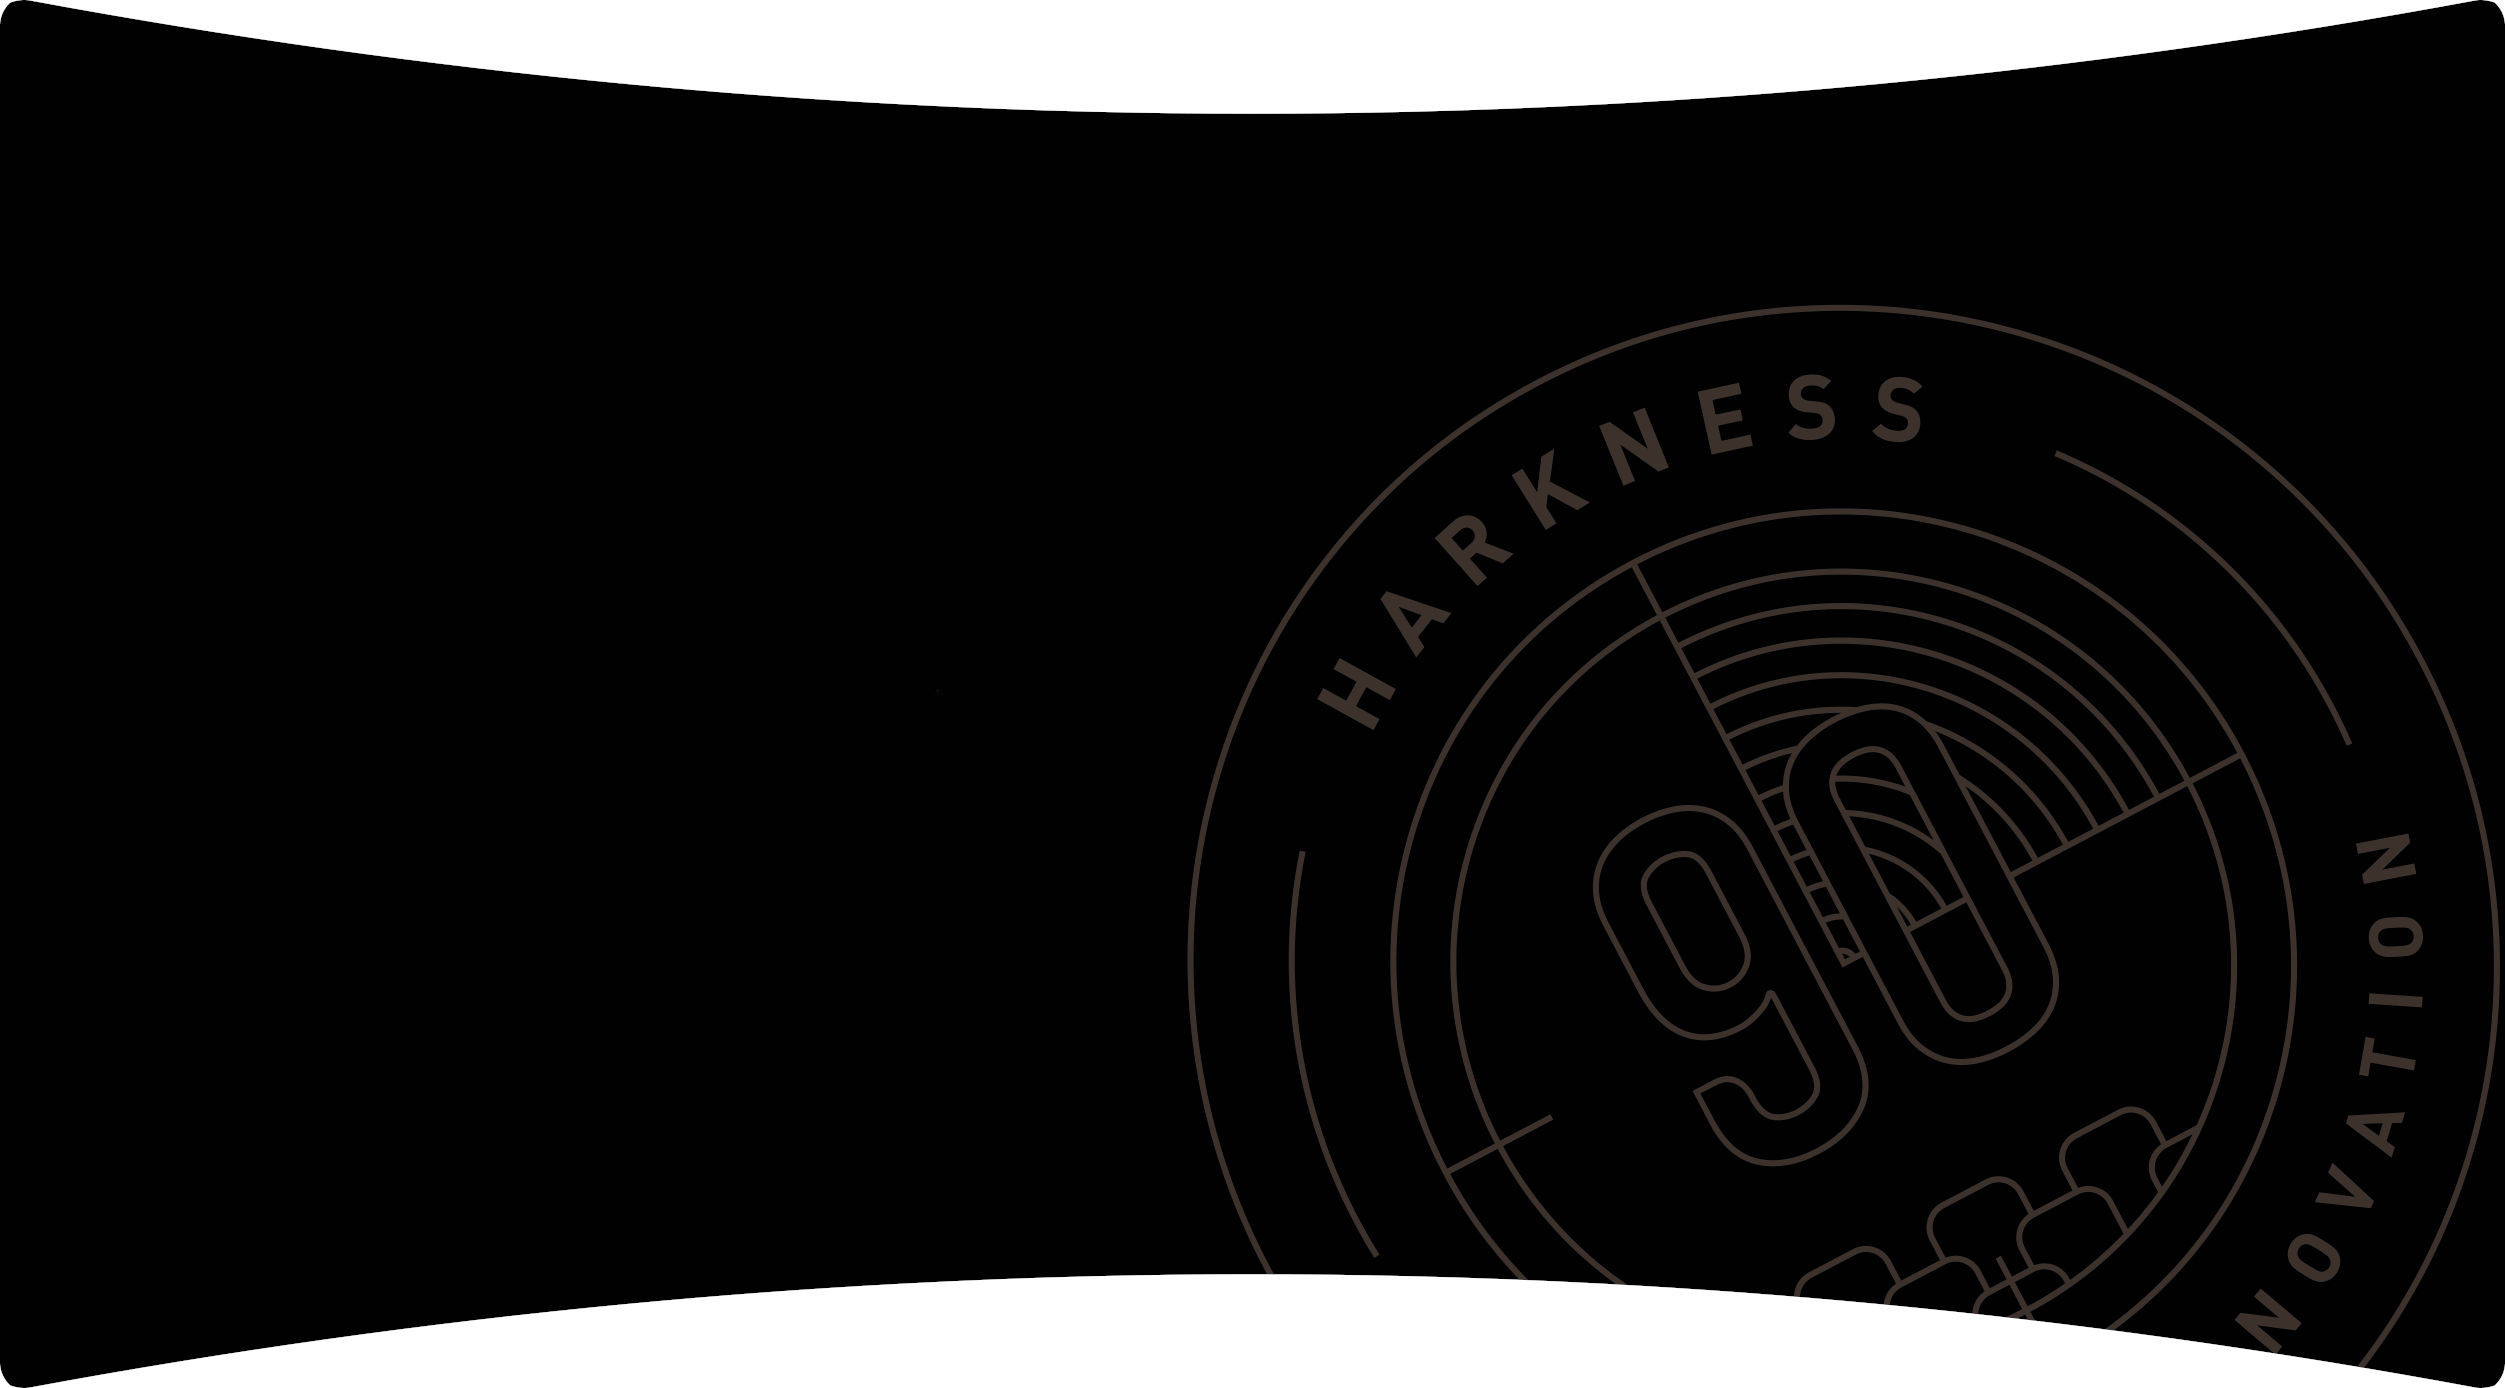 Harkness Header Image